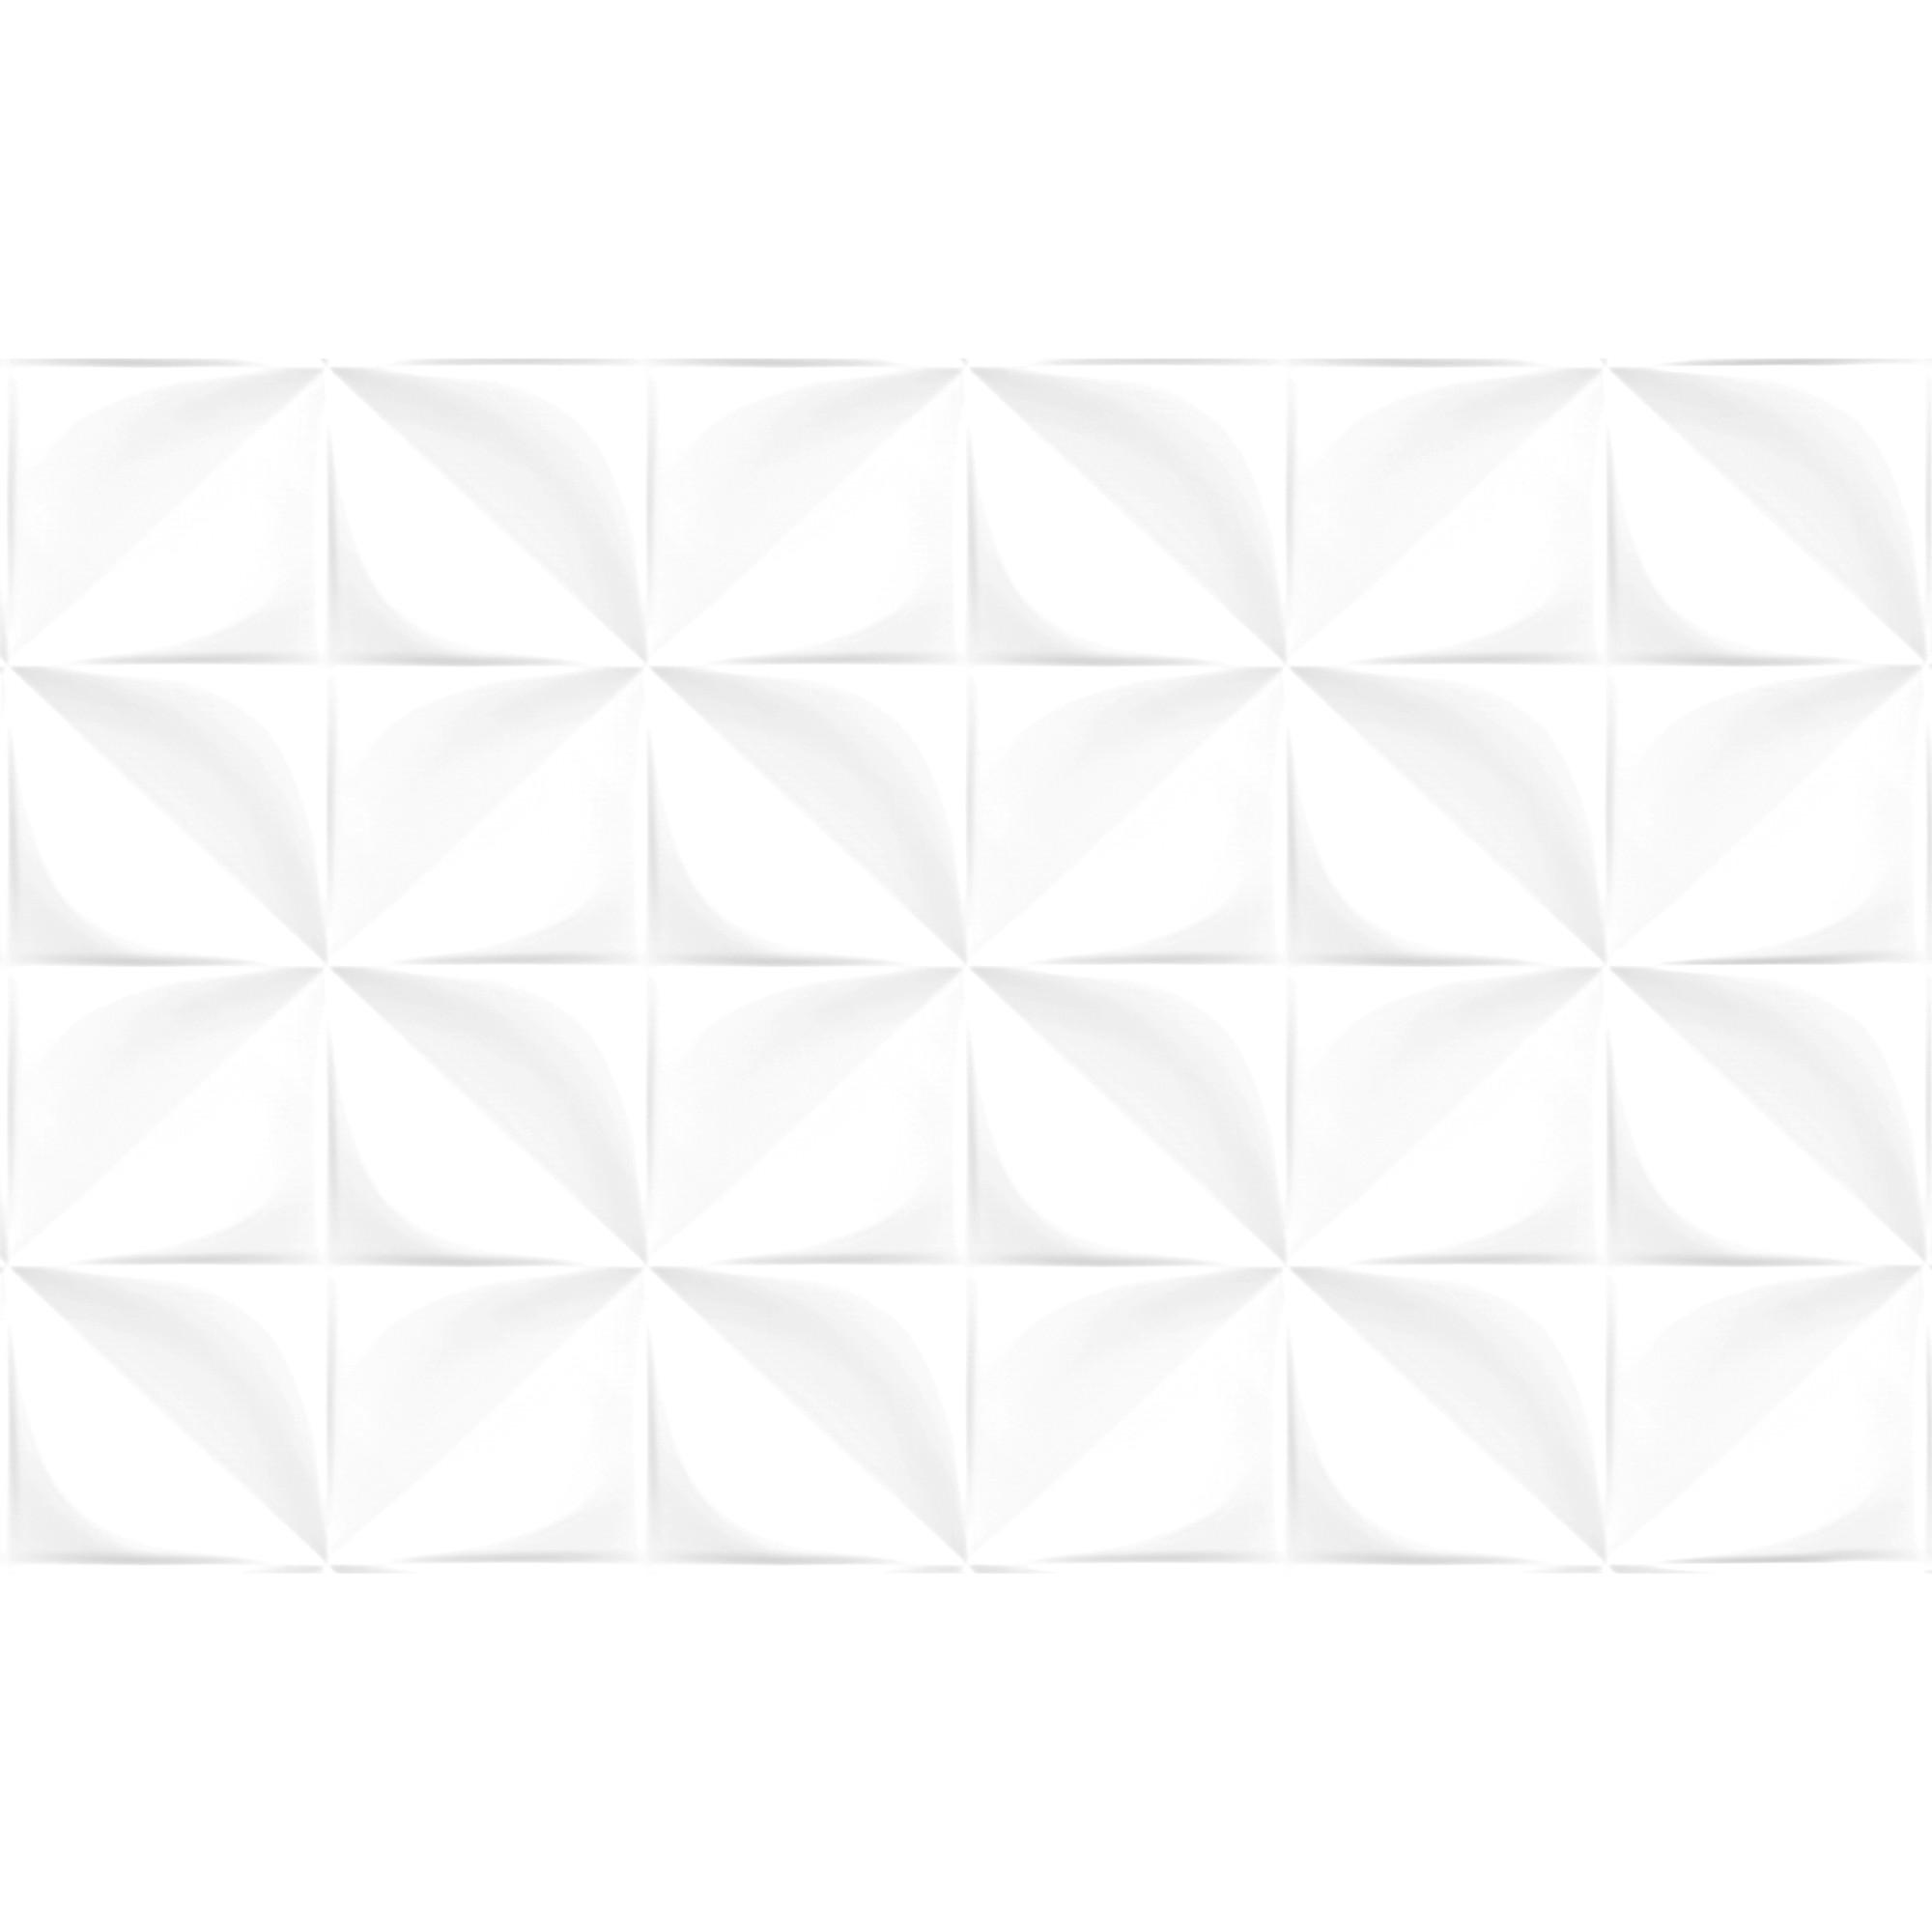 Revestimento Arielle Tipo A 37x59 cm Esmaltado Branco com Alto Relevo 239m Tecnologia de Impressao Digital HD